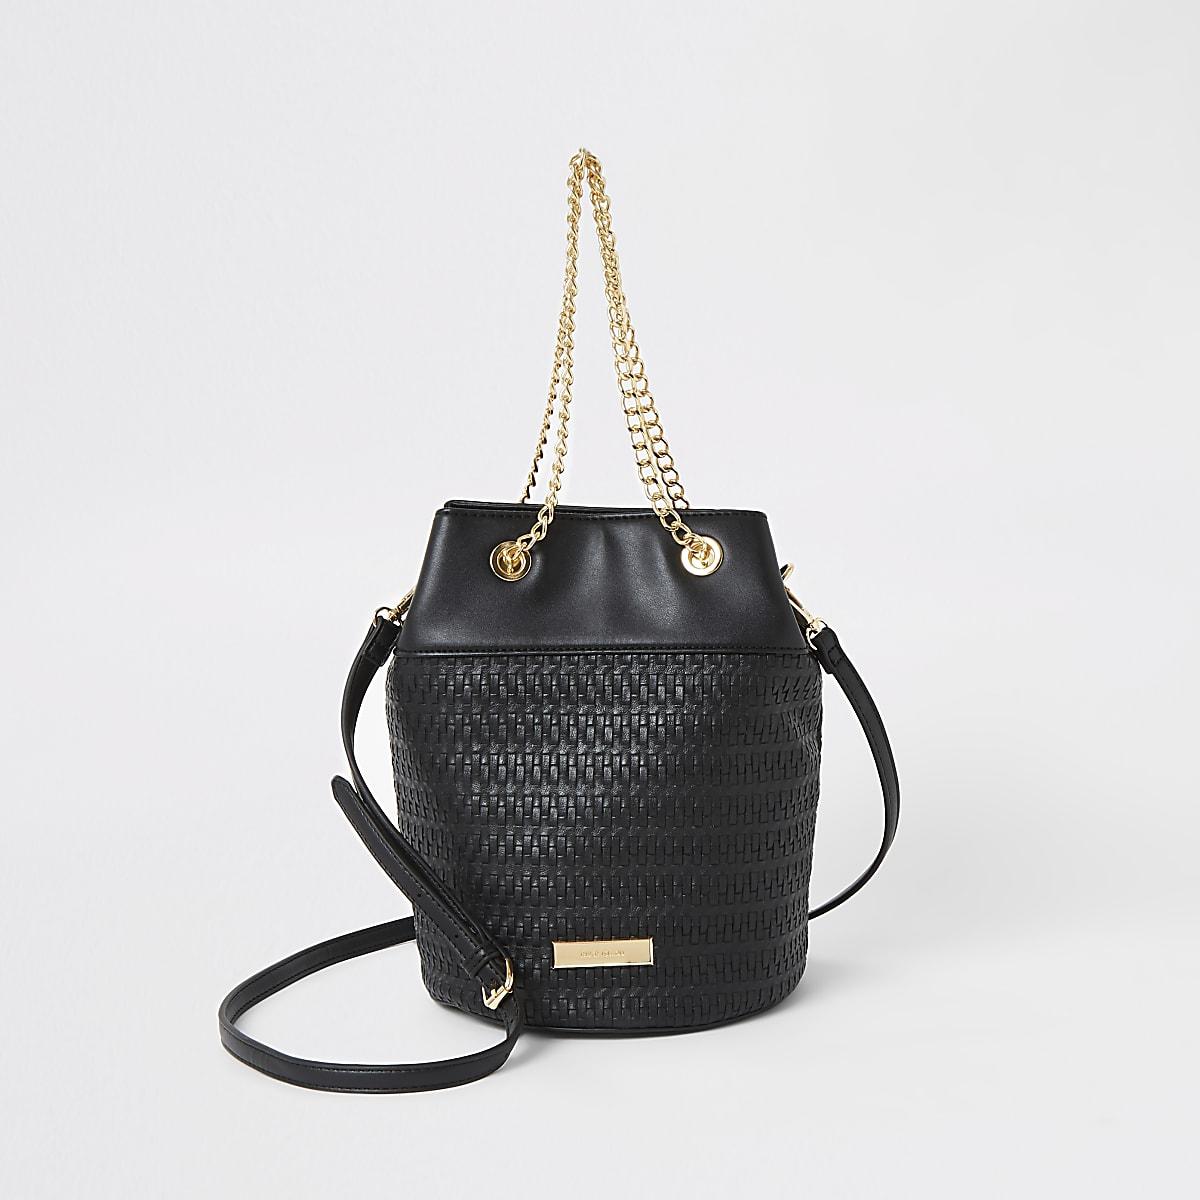 Black woven bucket bag